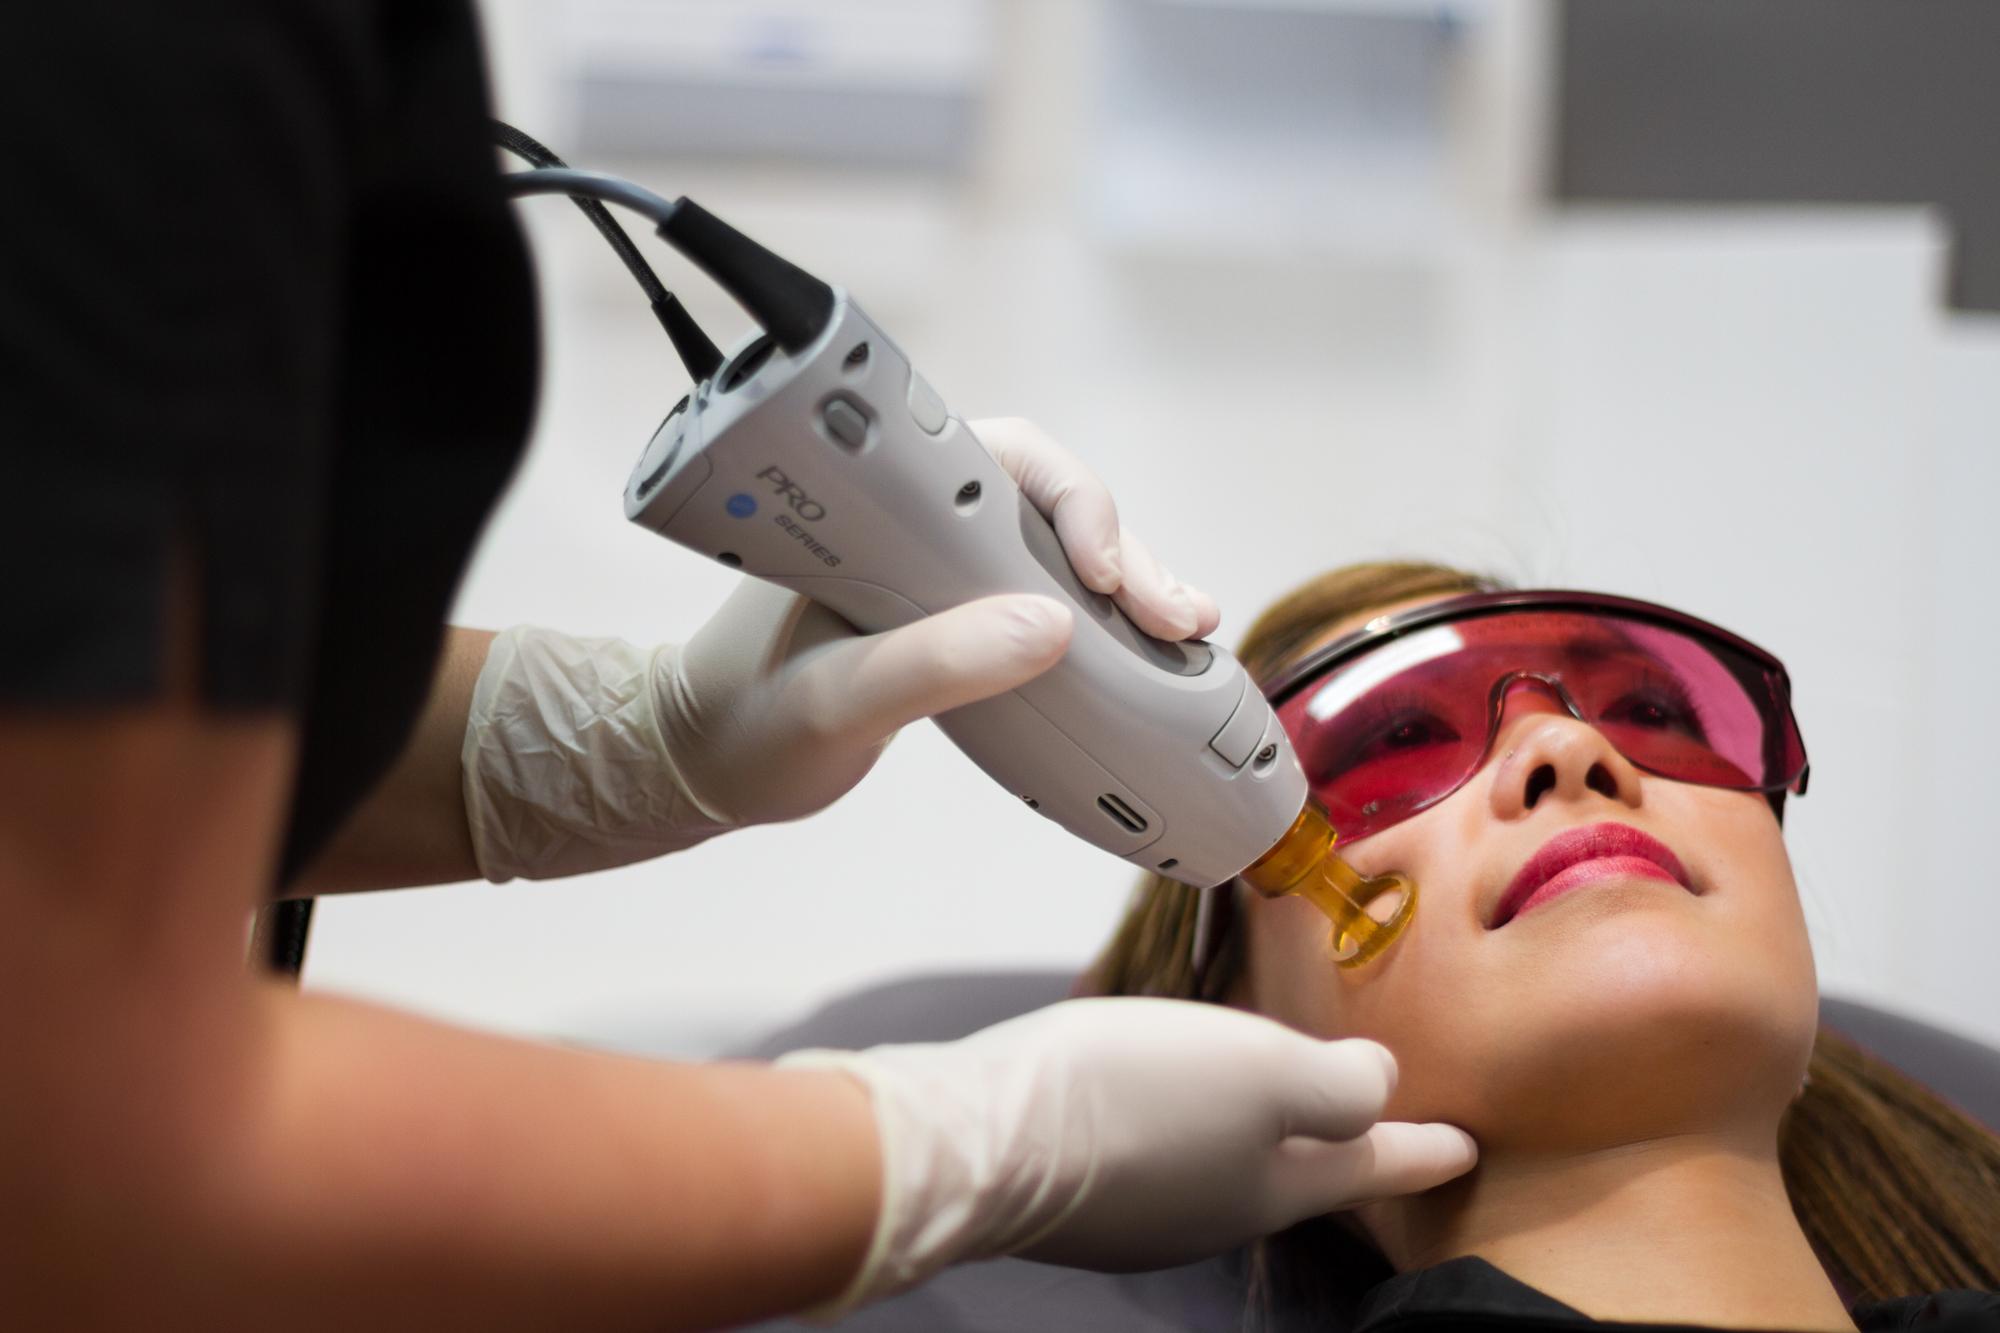 Laser hair removal jalandhar punjab india at affordable cost laser hair removal cost jalandhar punjab india solutioingenieria Images